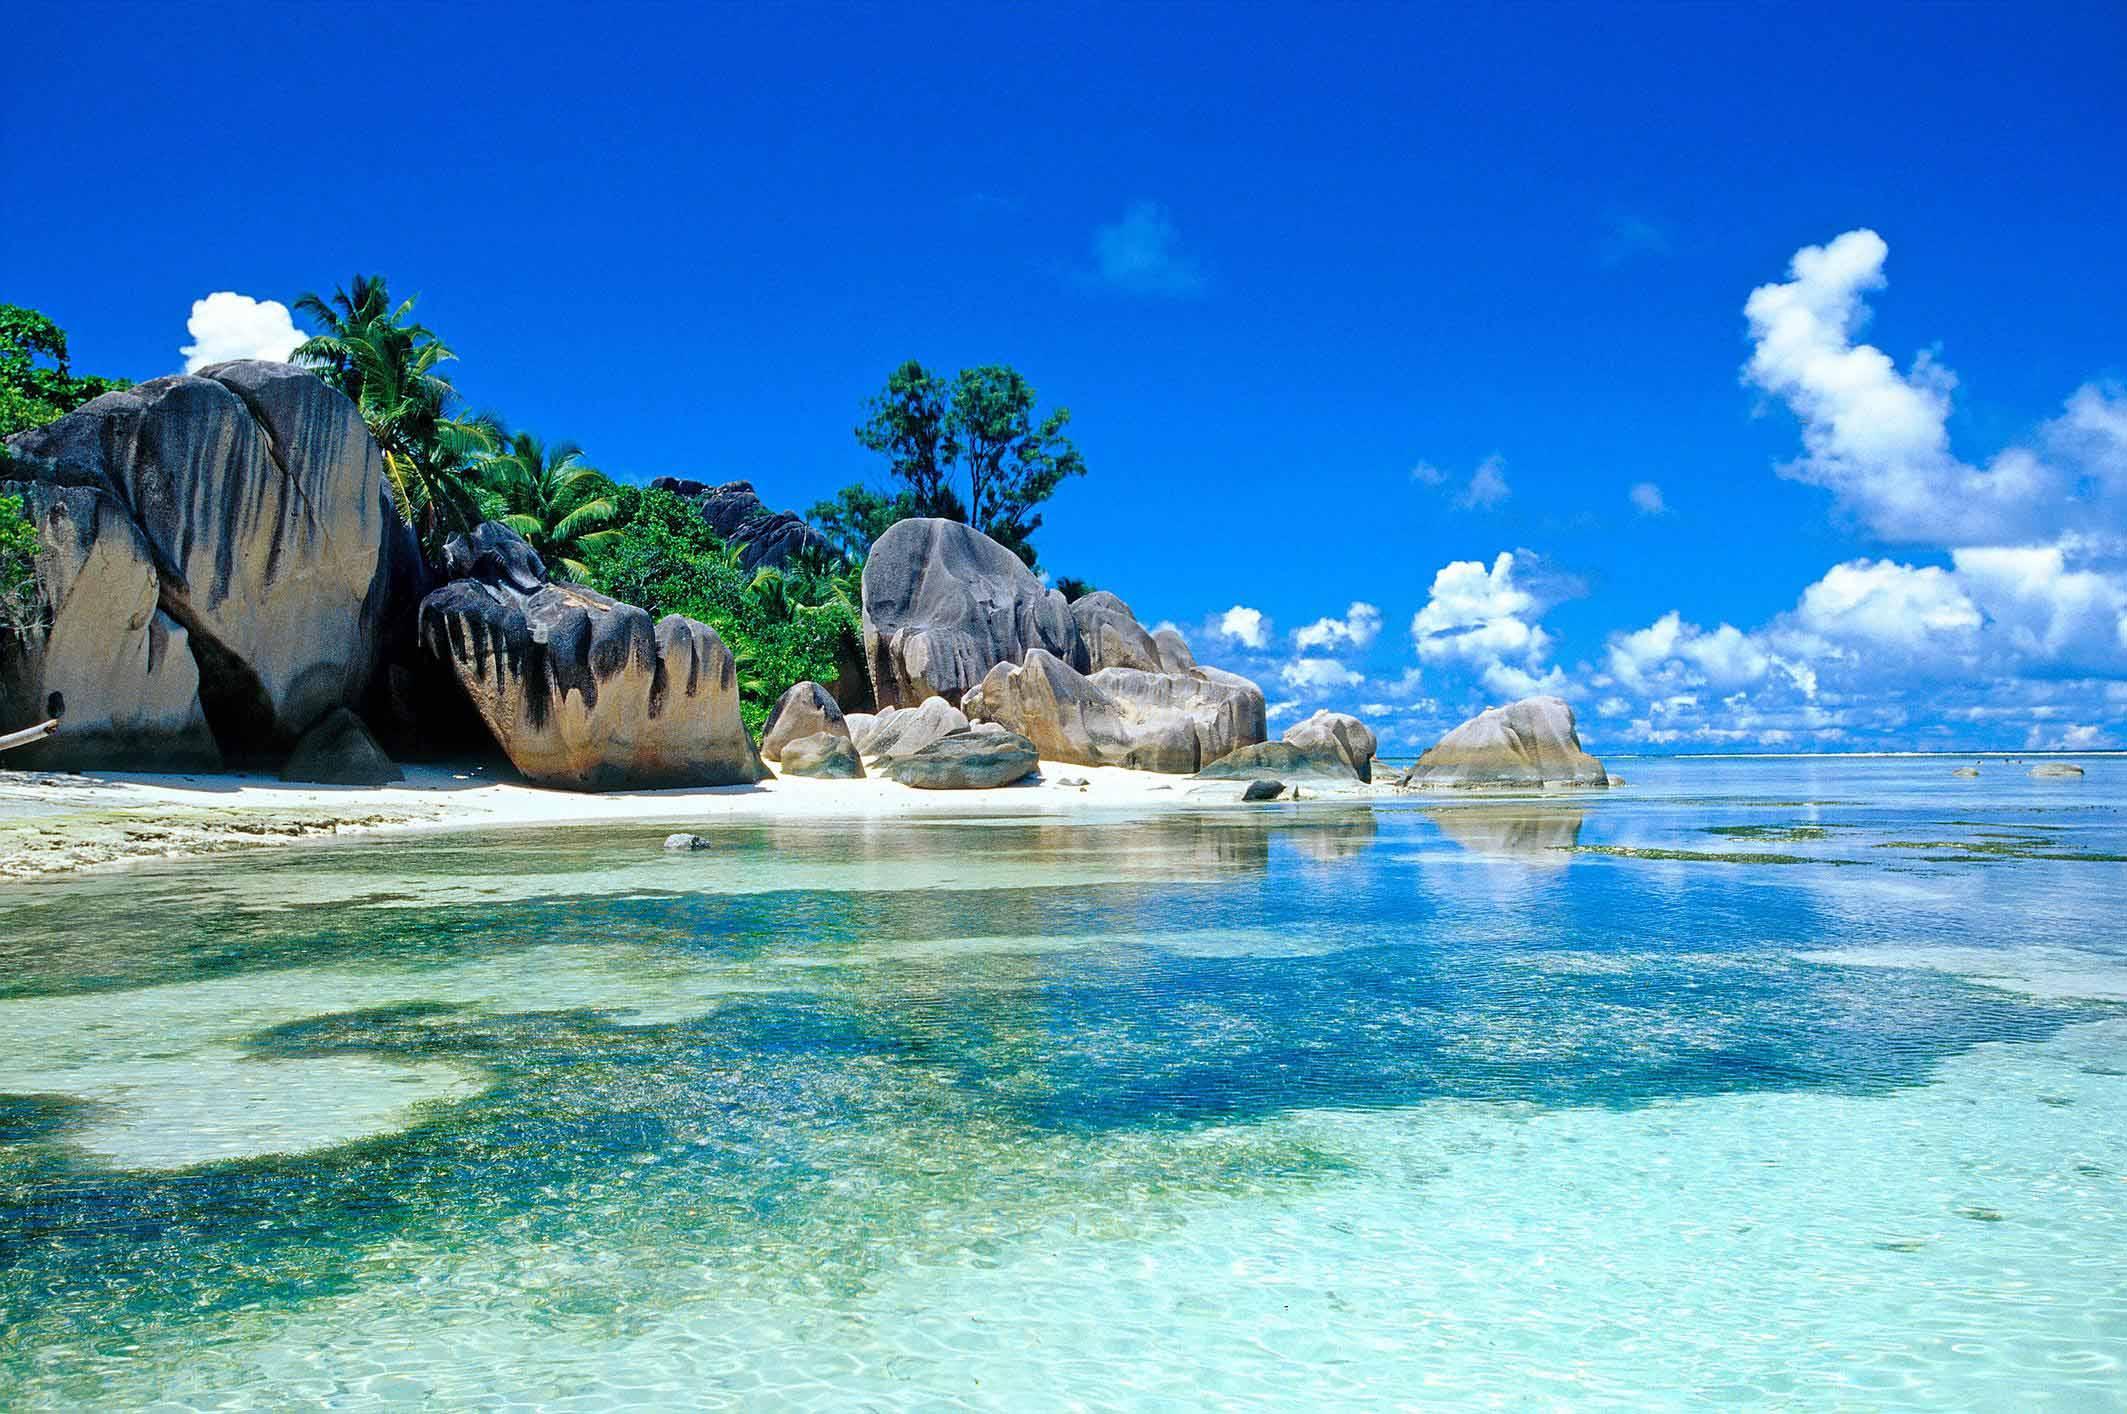 Beautiful beach in the summer season